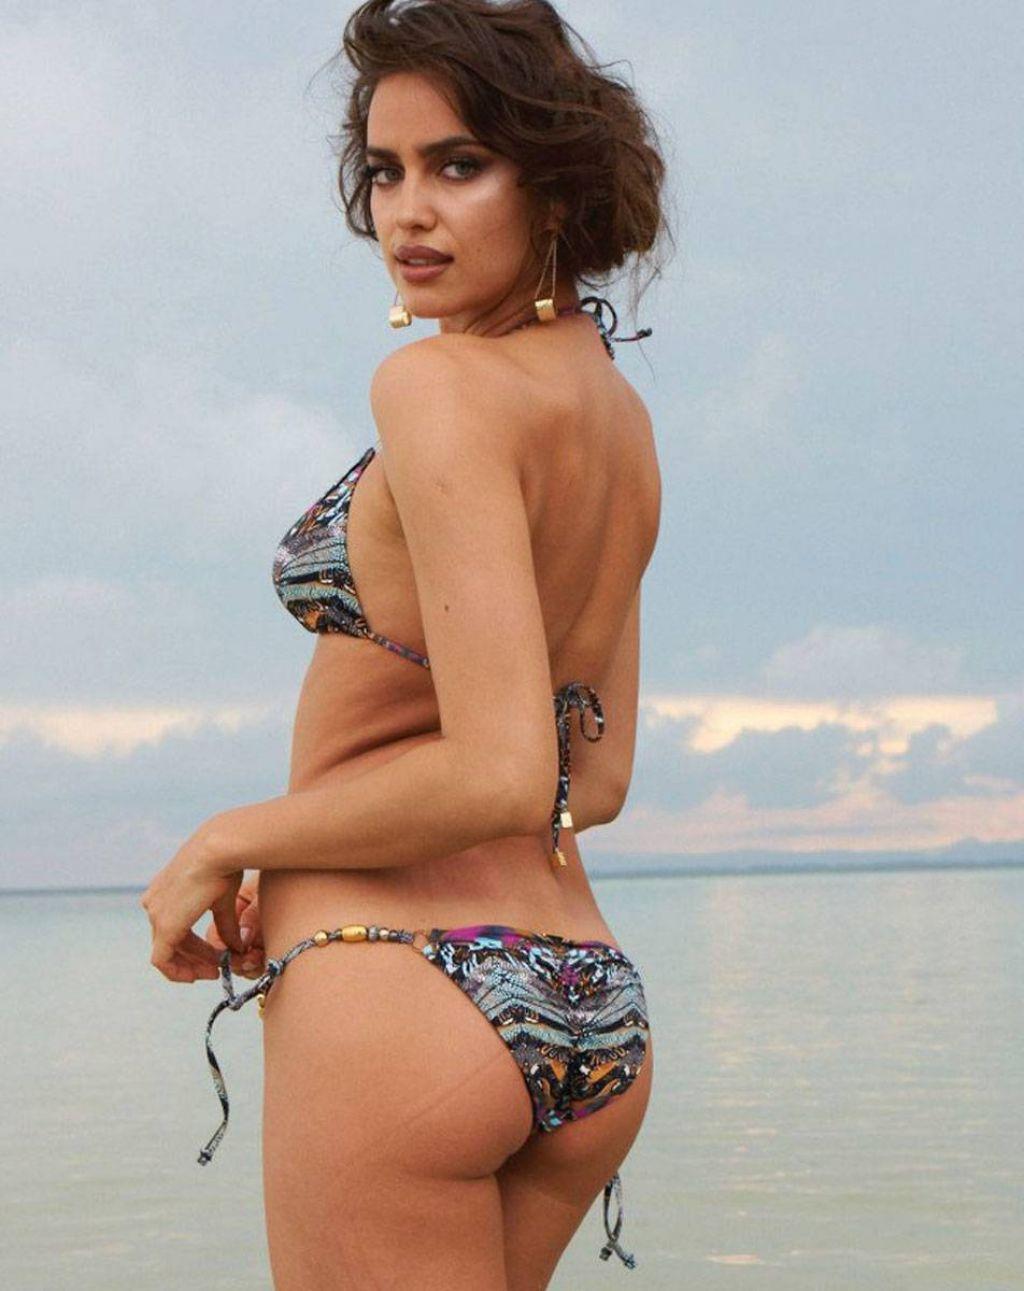 Irina Shayk Photoshoot